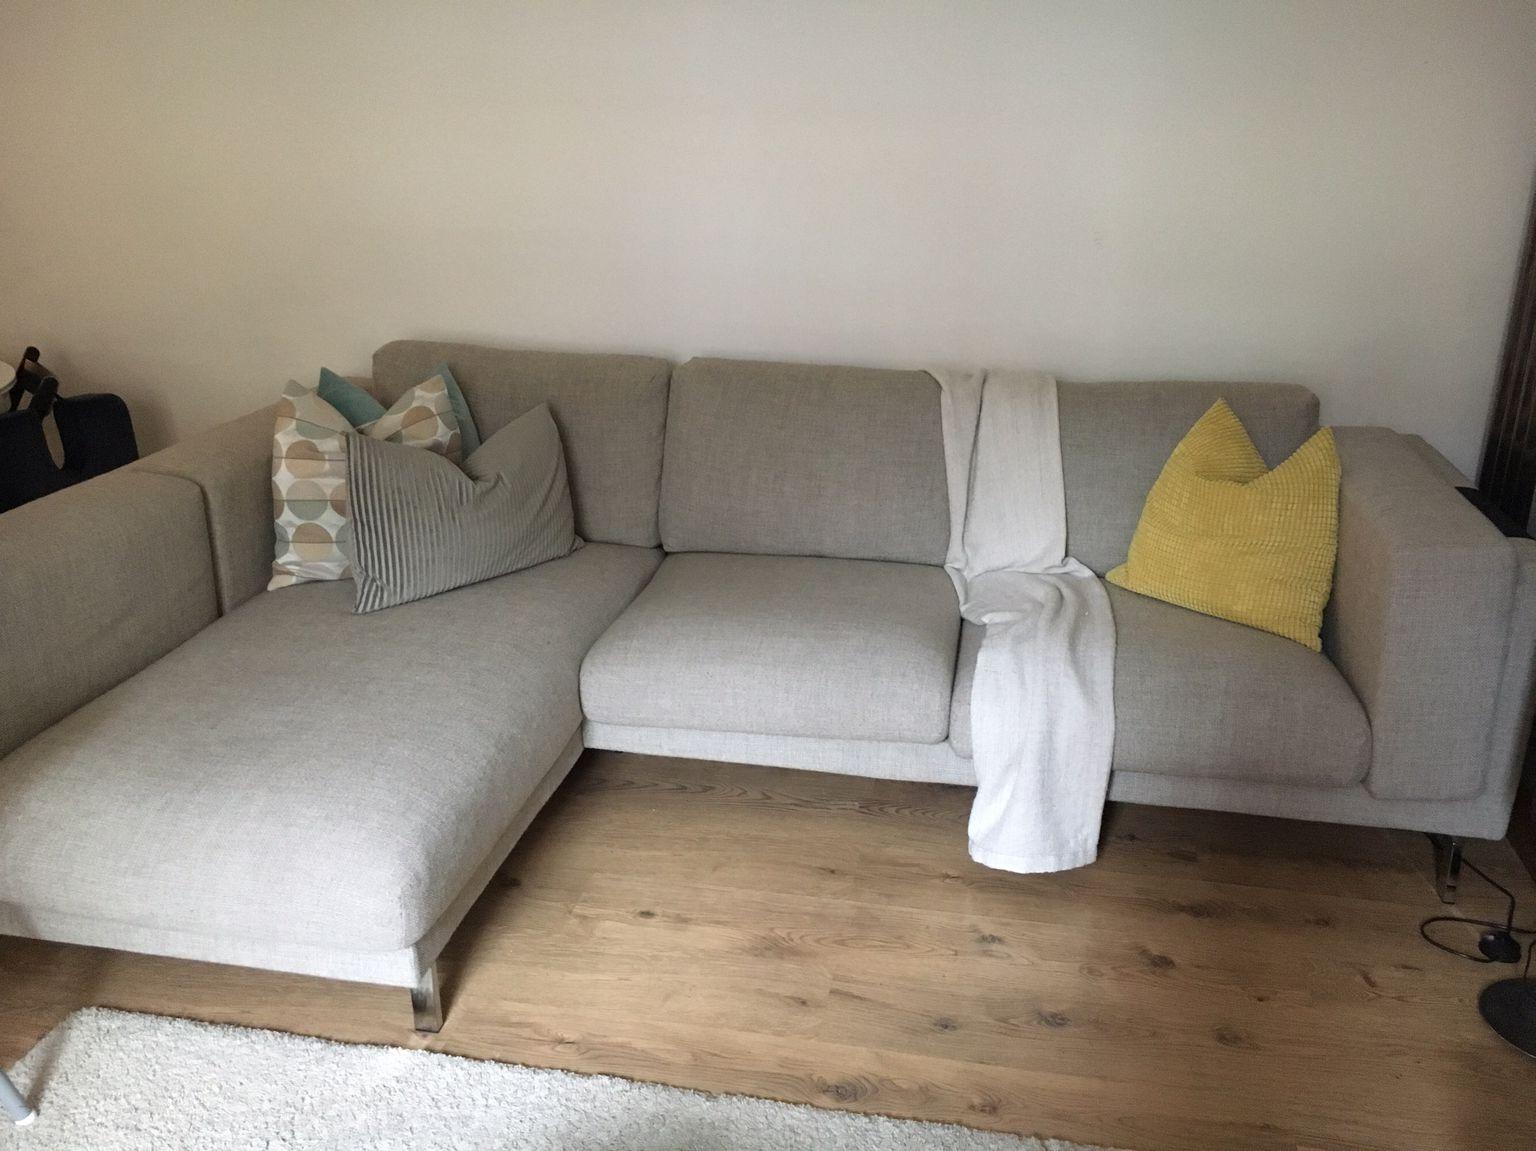 Sofa Nockeby Y7du Used Ikea Nockeby Corner sofa In Light Grey Wood In Wc1h London for